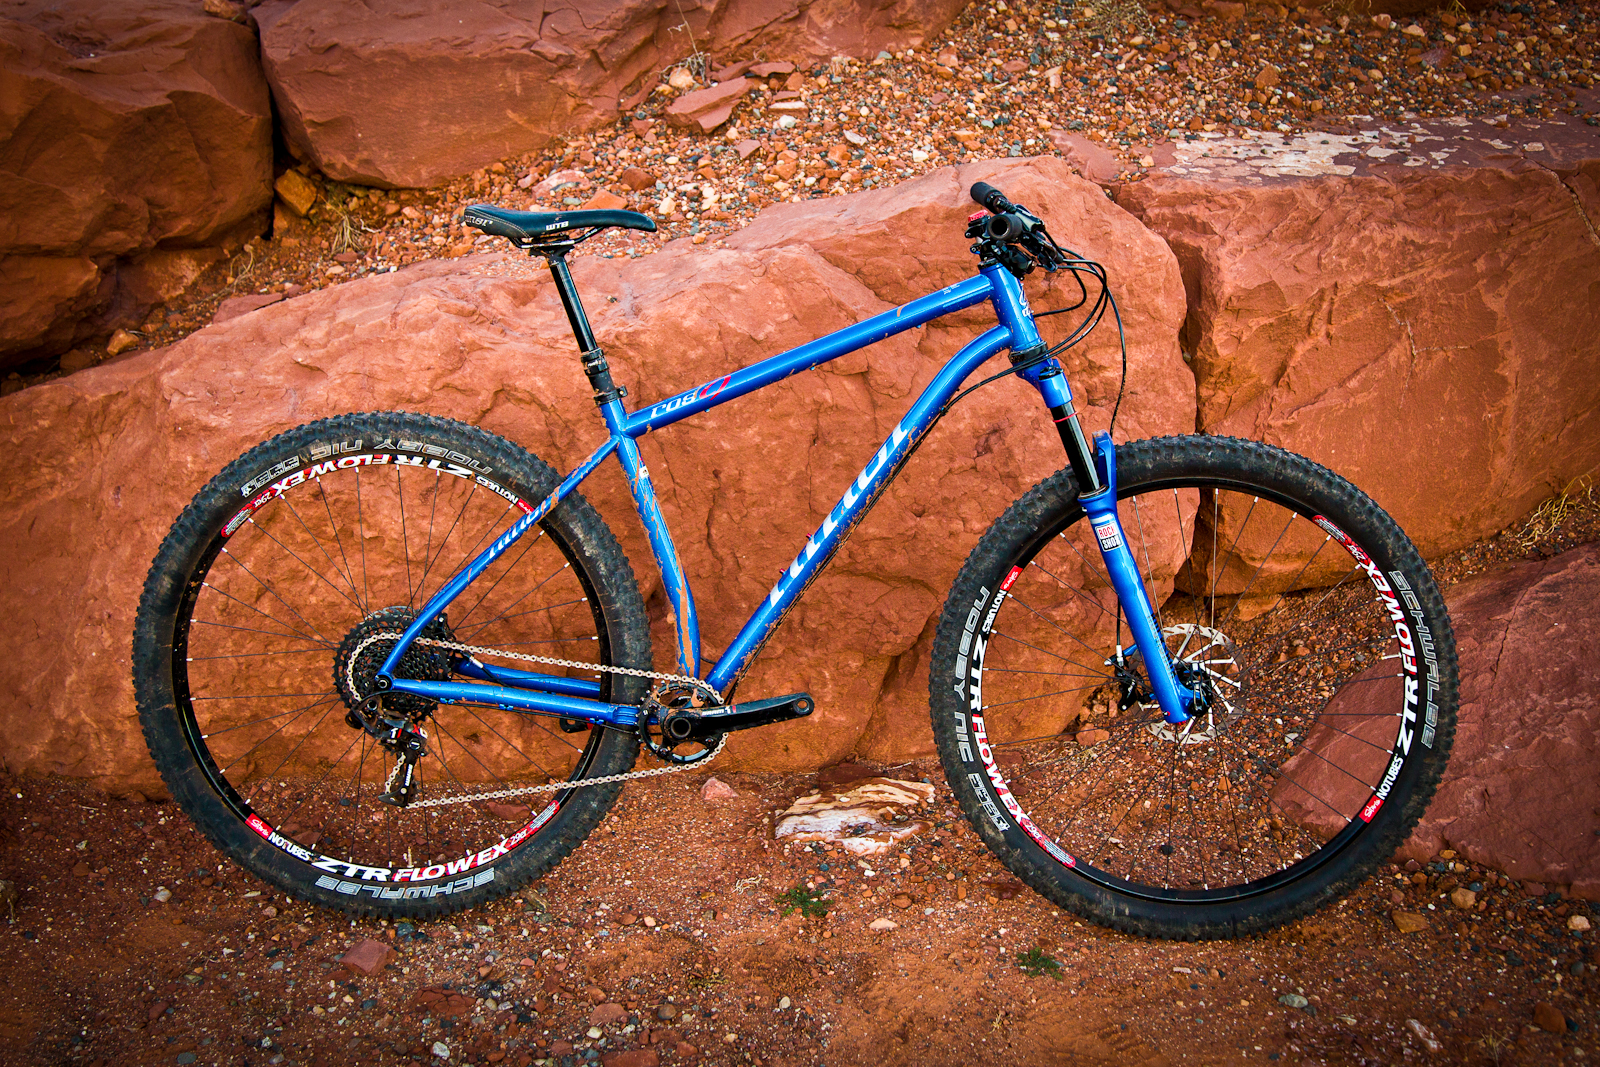 4f7182cc27d 2014 Niner ROS 9 - 25 Mountain Bikes Tested - Vital MTB Test ...